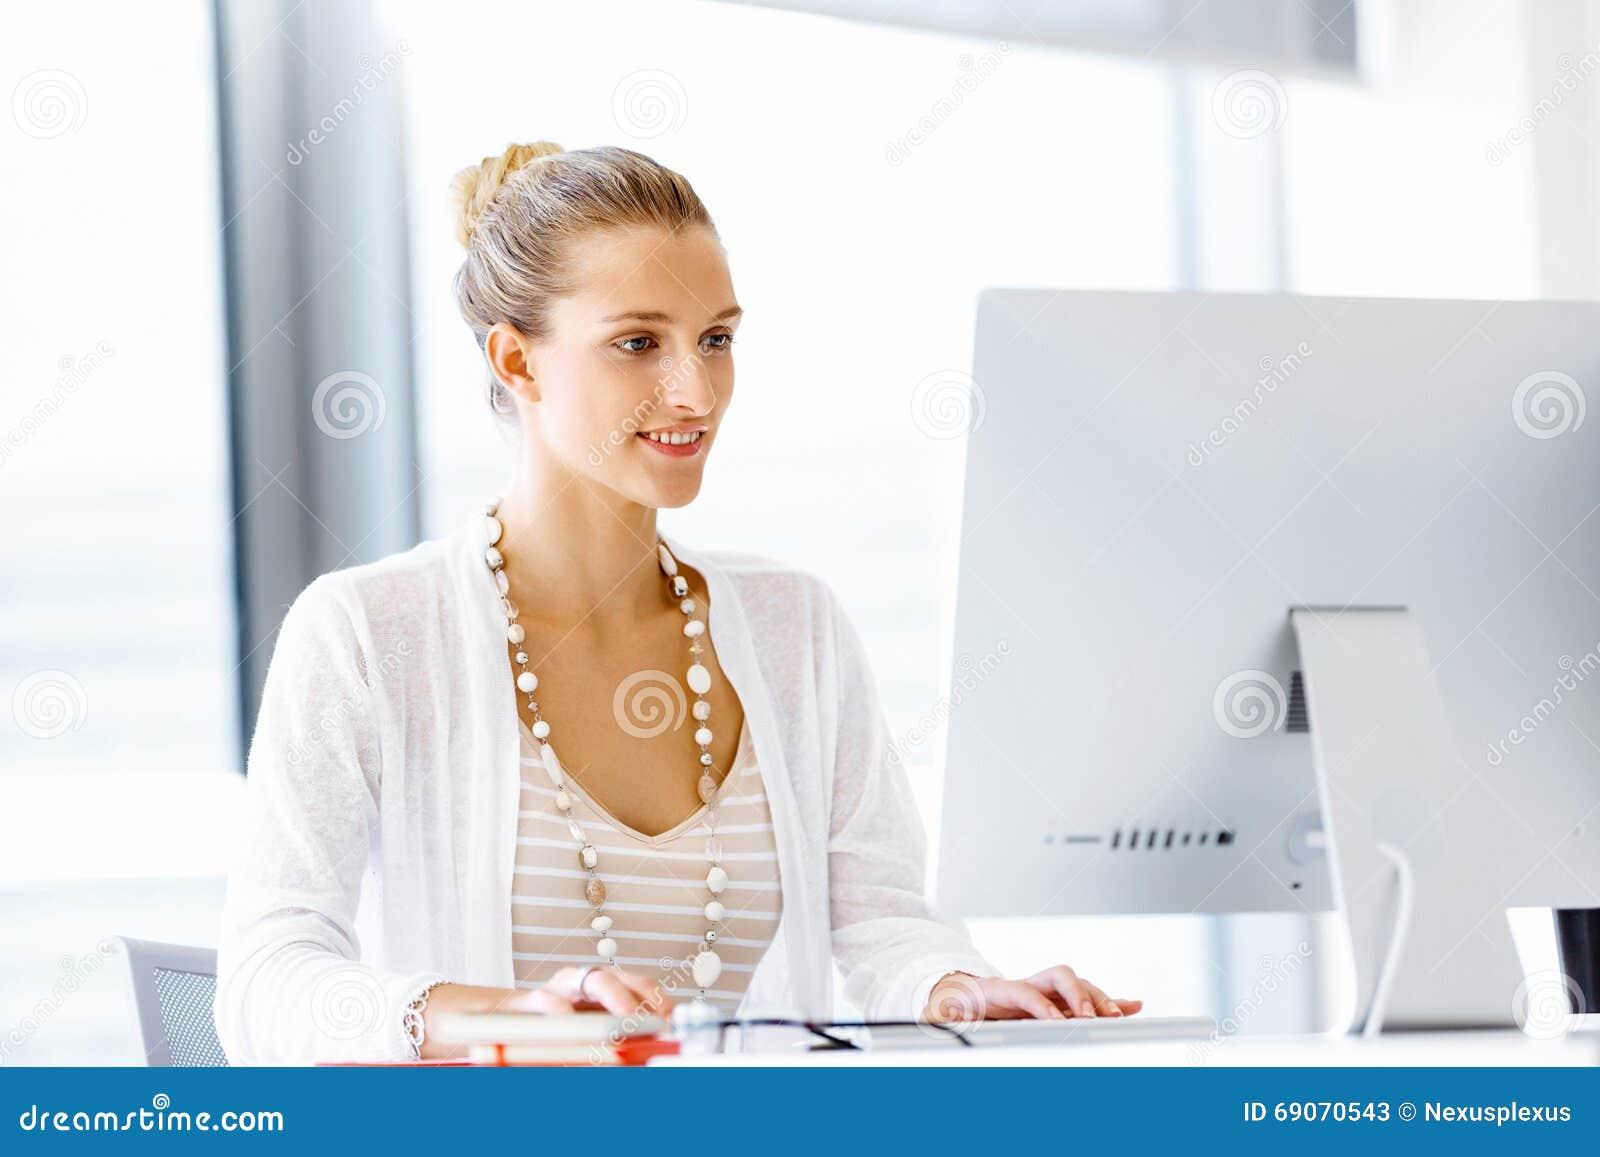 employ de bureau attirant s 39 asseyant au bureau photo stock image 69070543. Black Bedroom Furniture Sets. Home Design Ideas